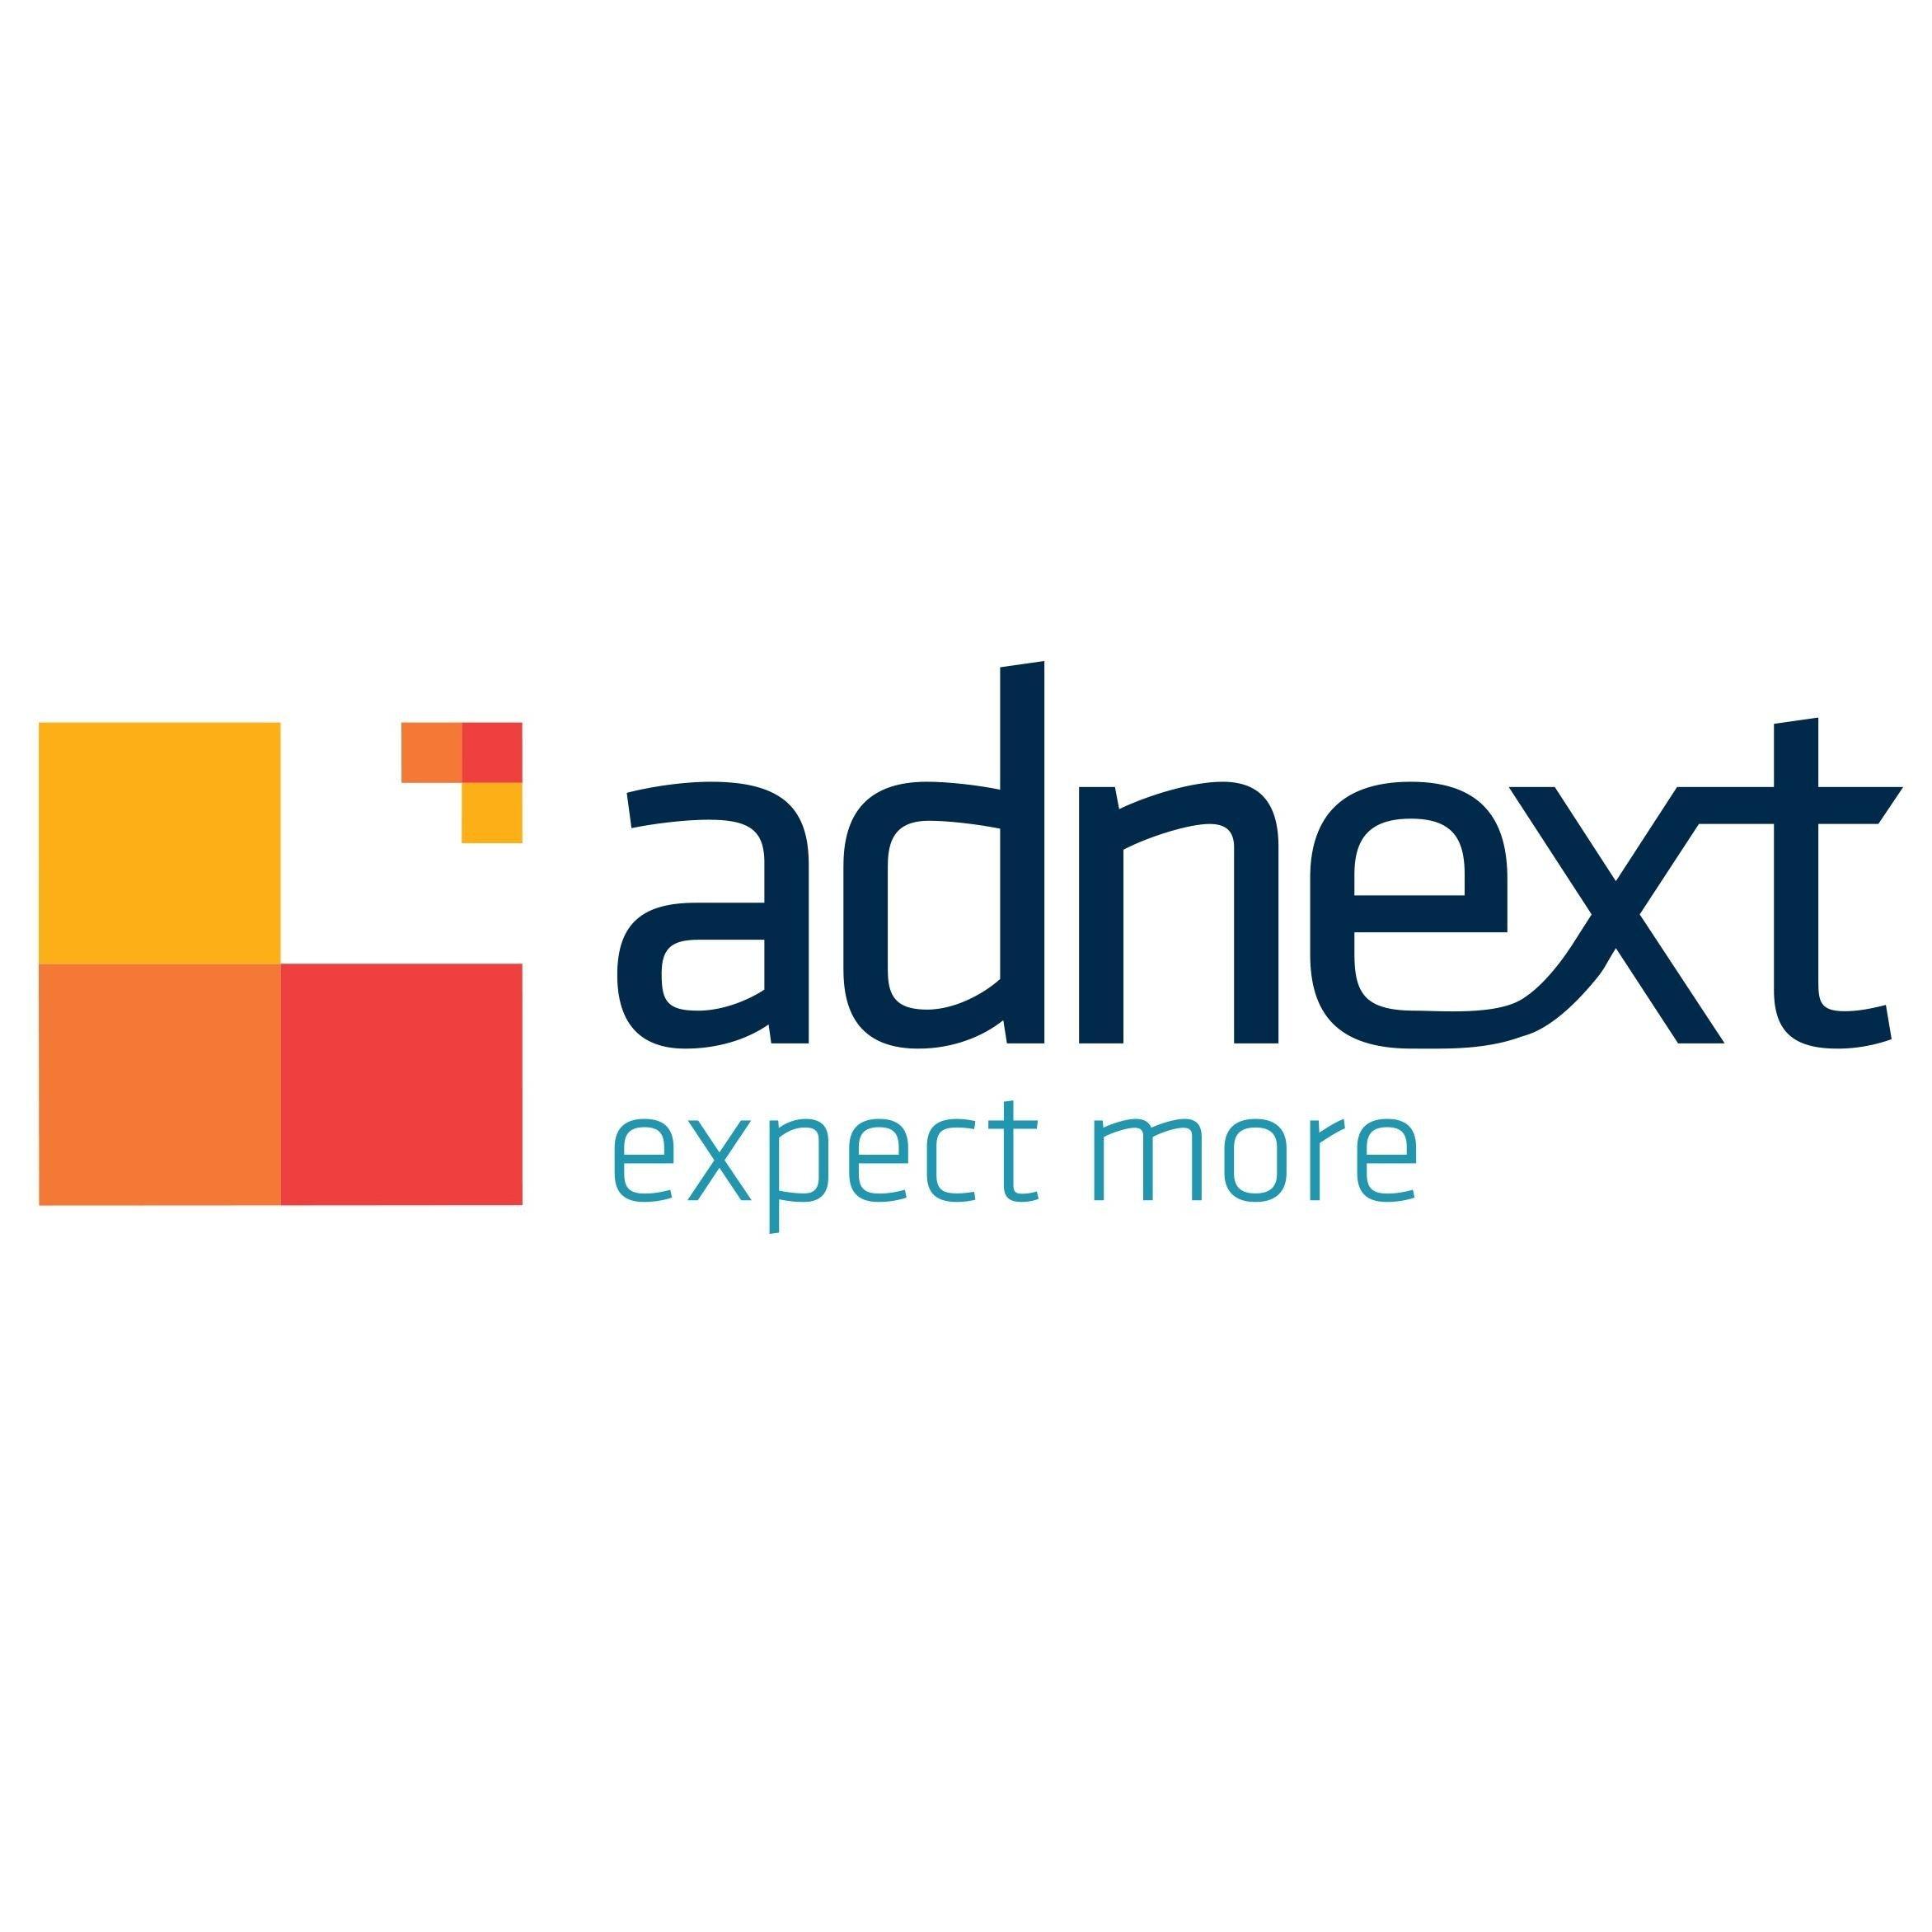 Adnext